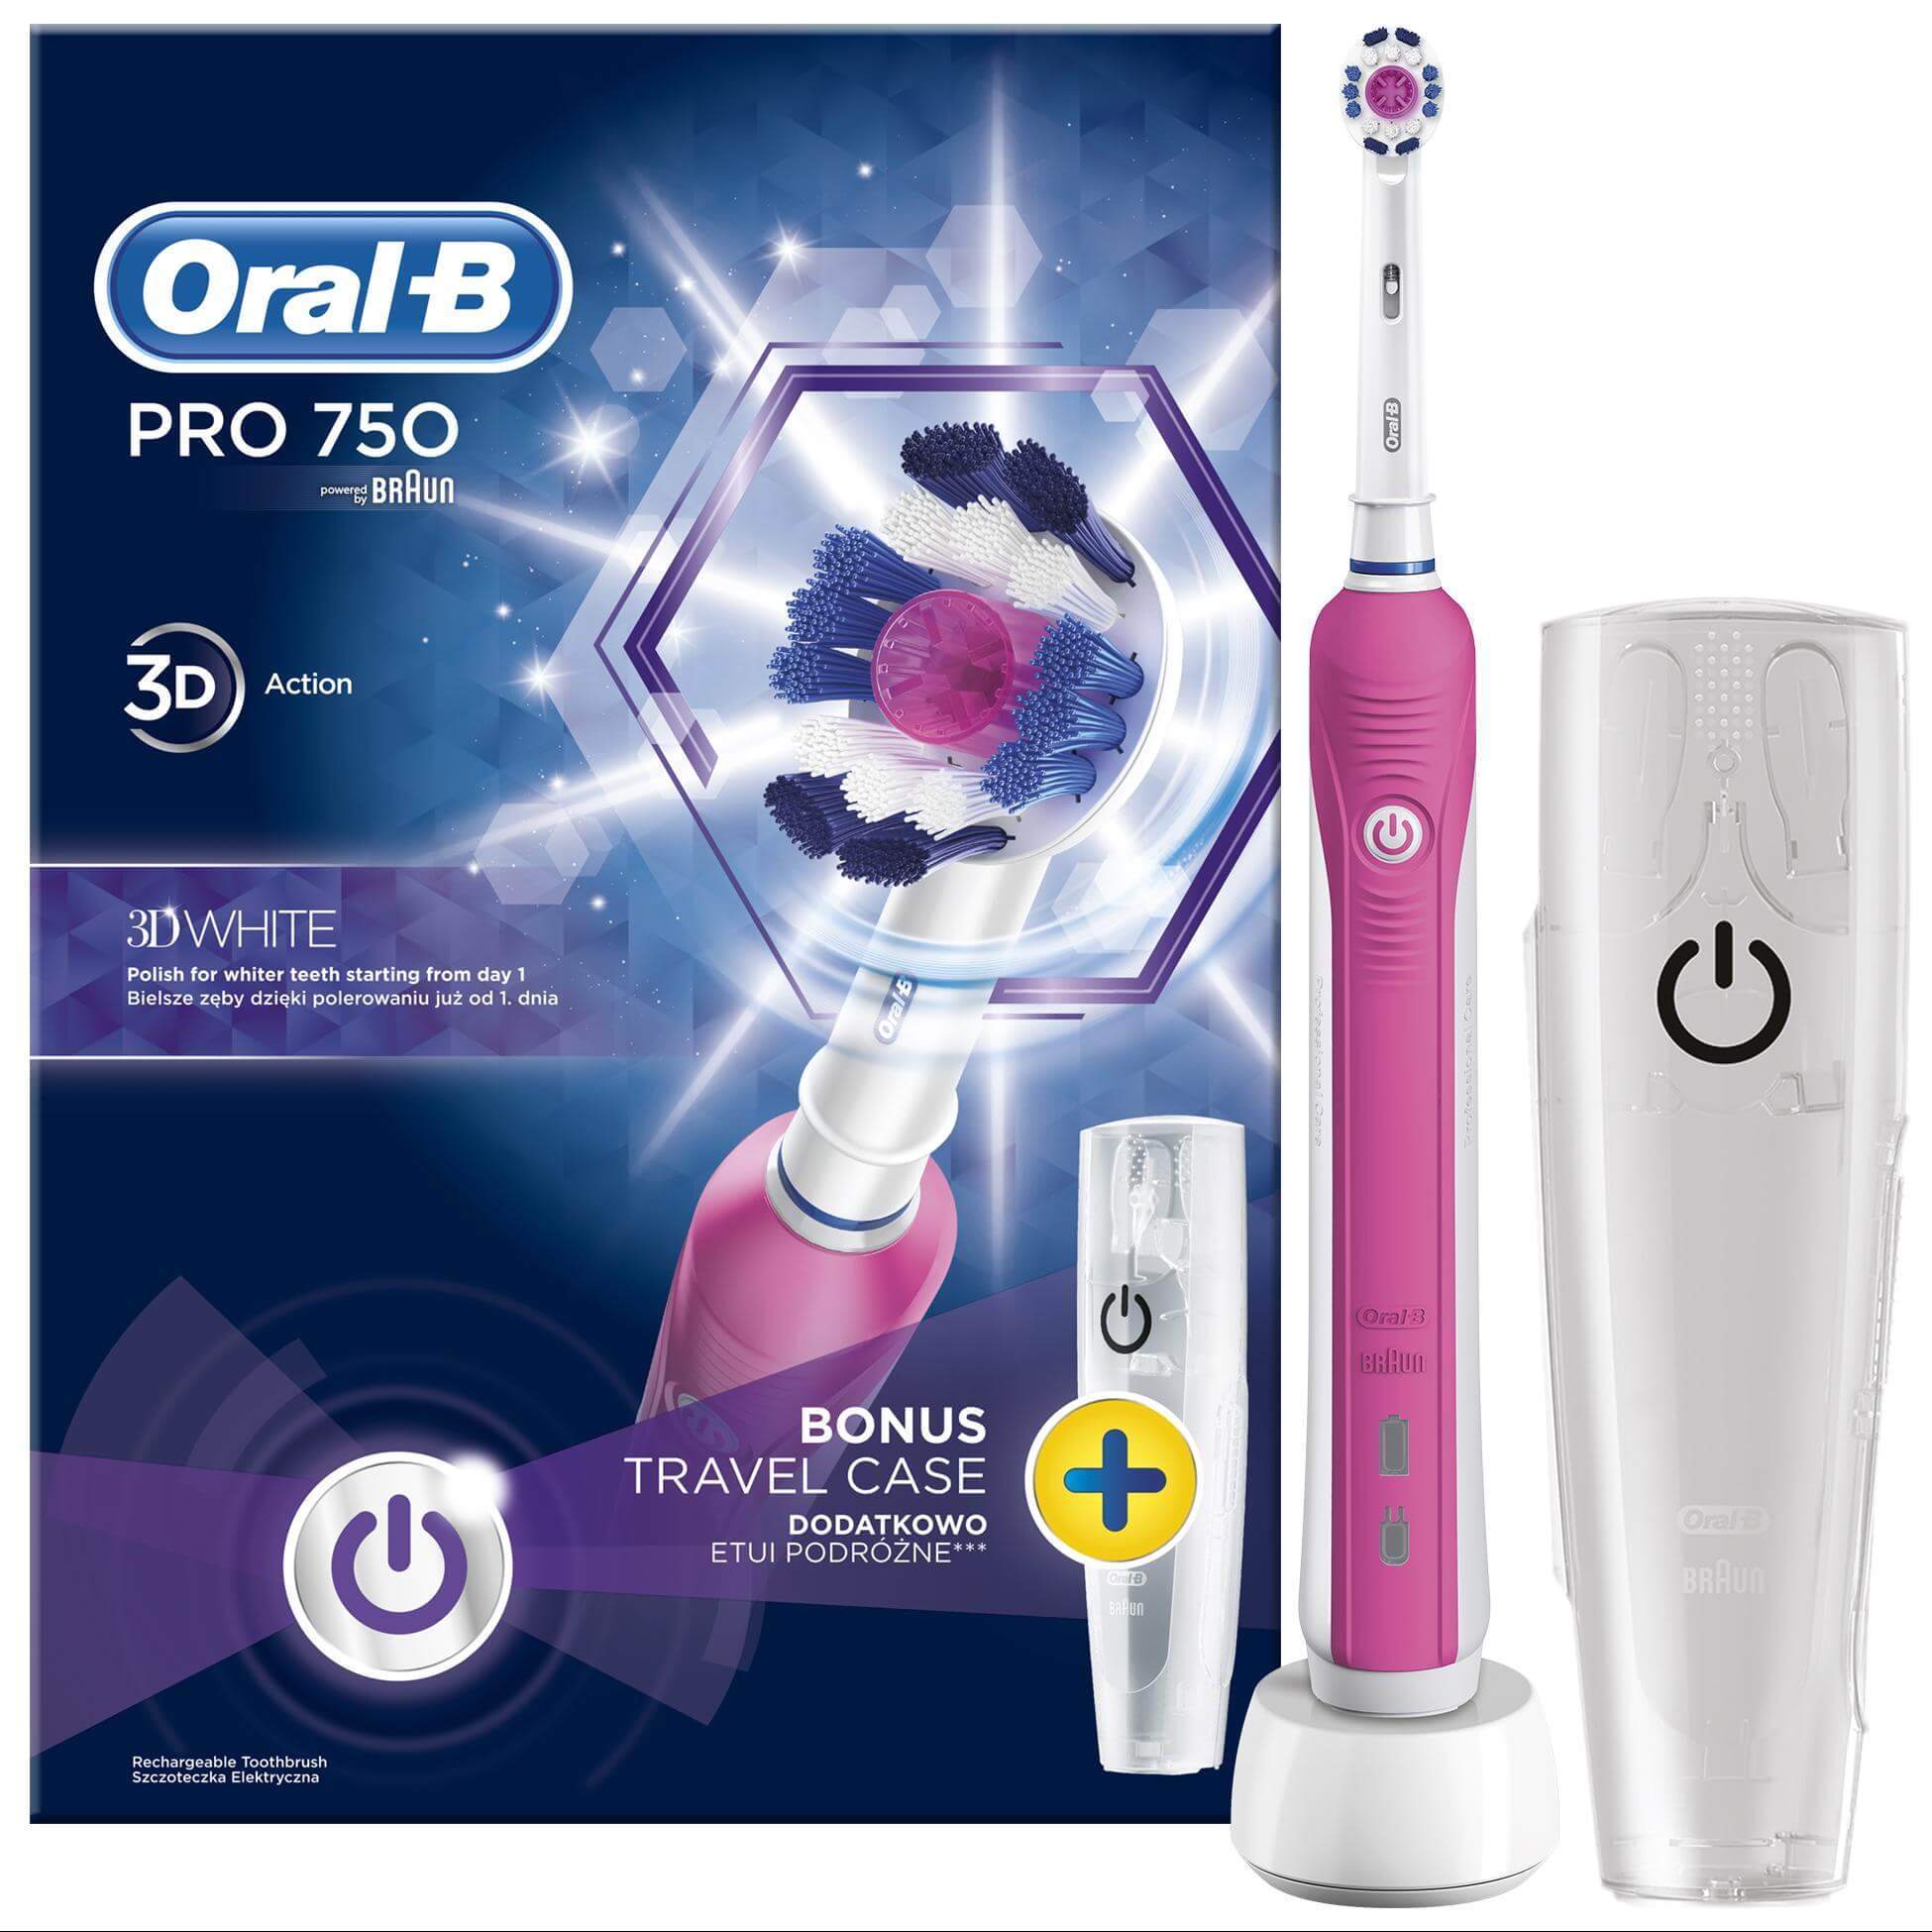 Oral-B Pro 750 3D WhiteSpecial EditionΗλεκτρική Οδοντόβουρτσα για Βαθύ Καθαρισμό σε ΡοζΧρώμα